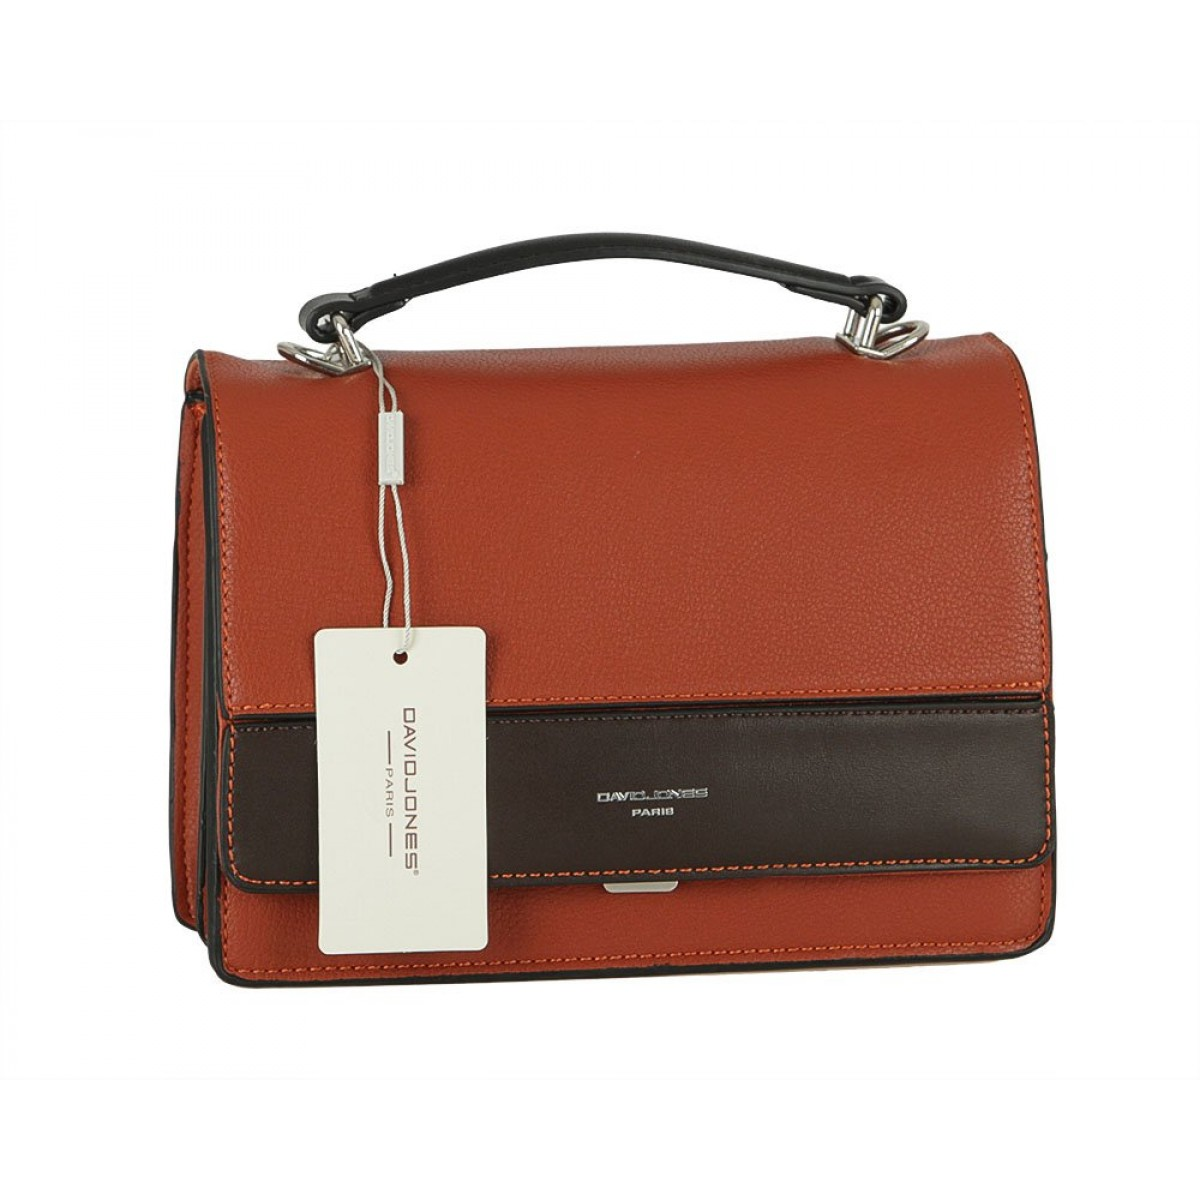 Жіноча сумка David Jones 6413-1 SIENNA